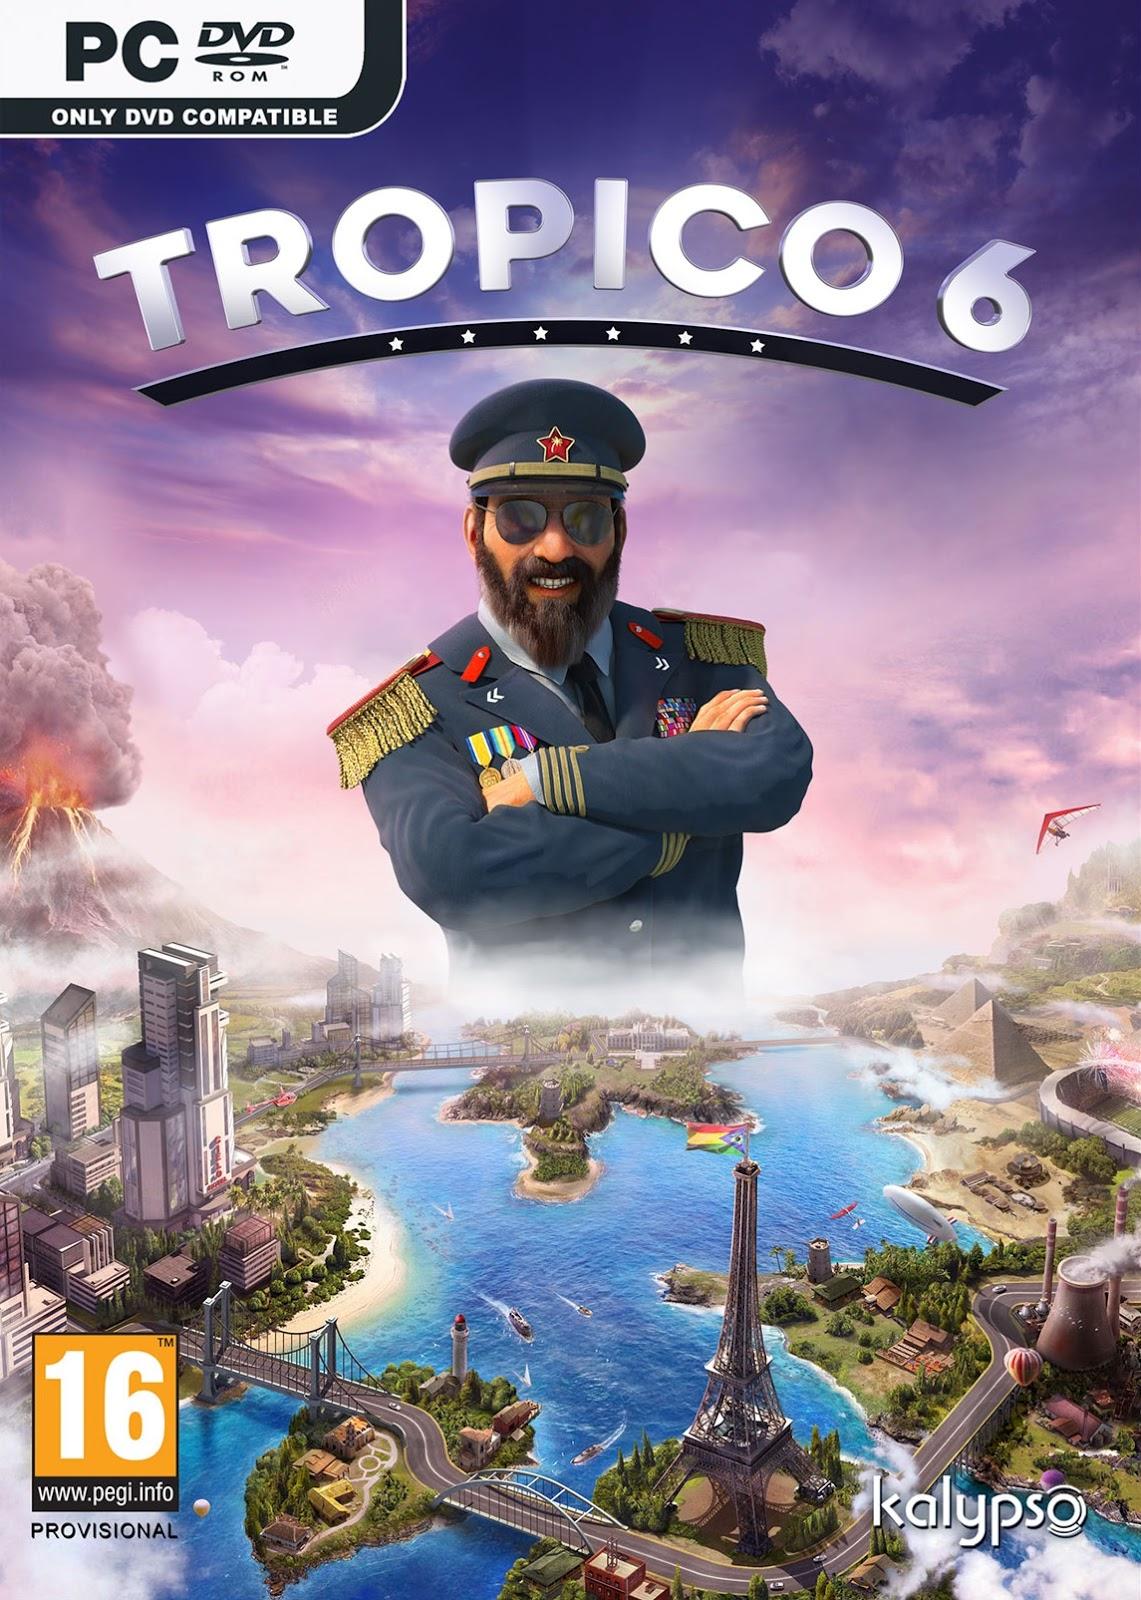 Descargar Tropico 6 PC Cover Caratula